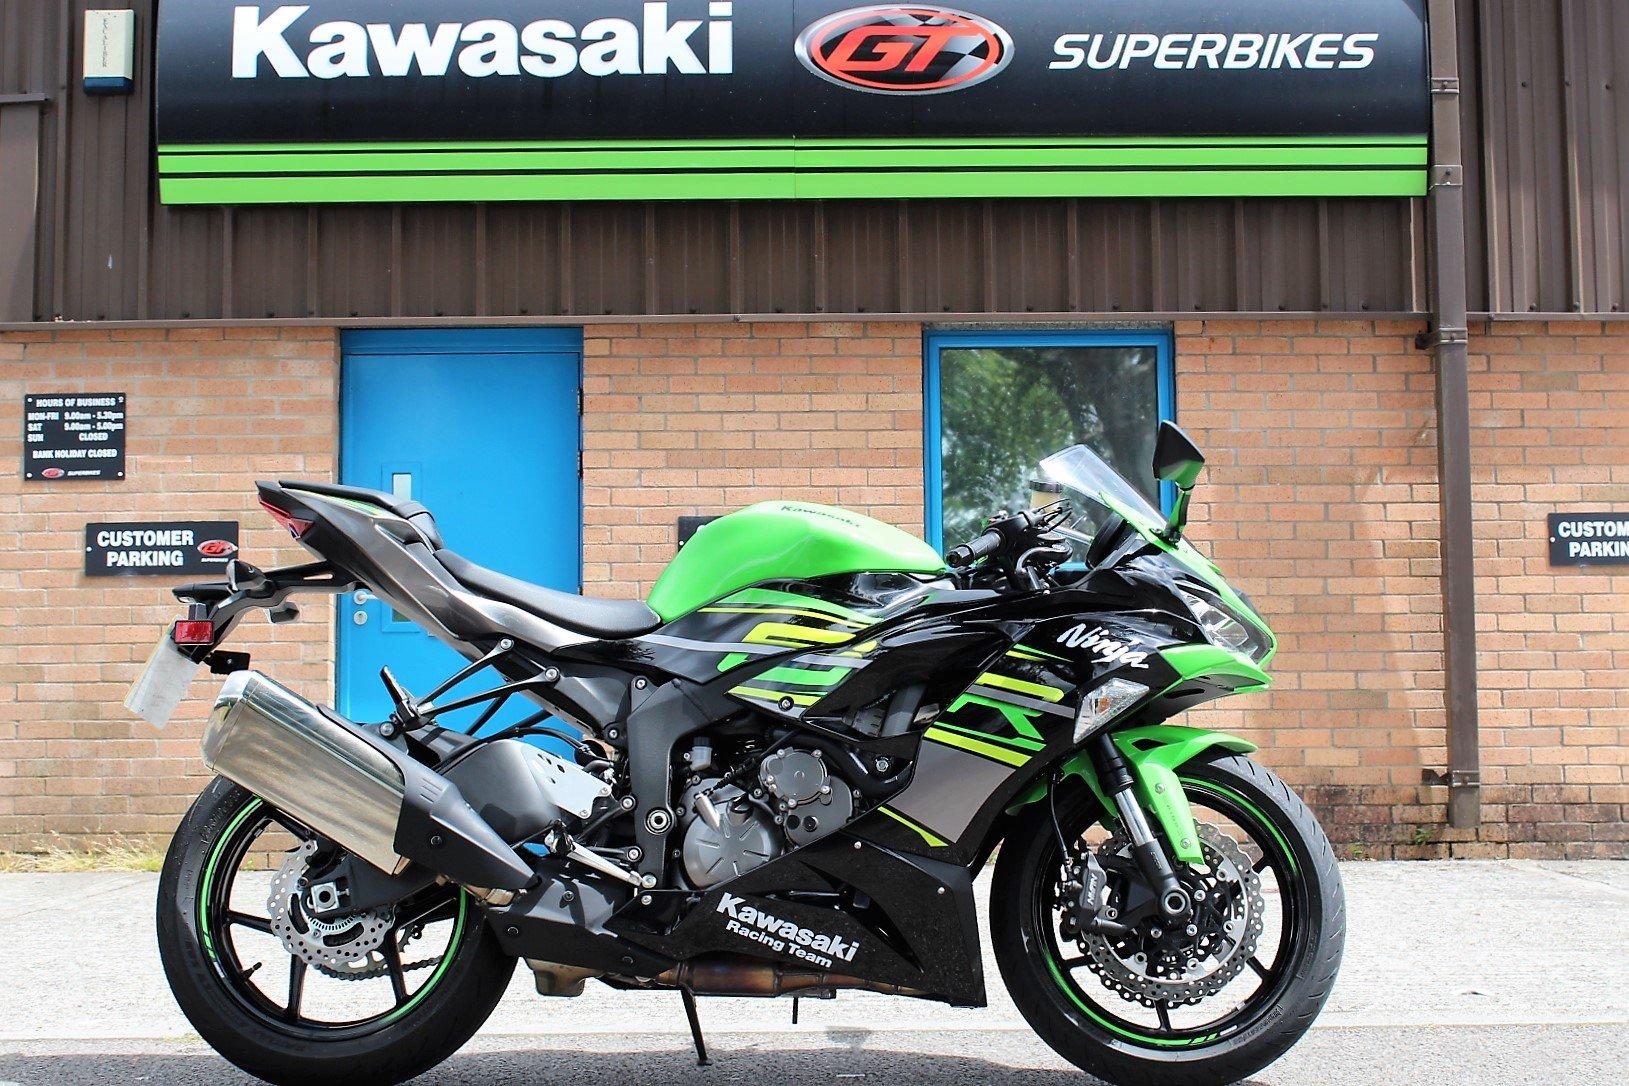 2019 19 Kawasaki Ninja ZX-6R 636 ABS KRT Edition SOLD (picture 1 of 6)